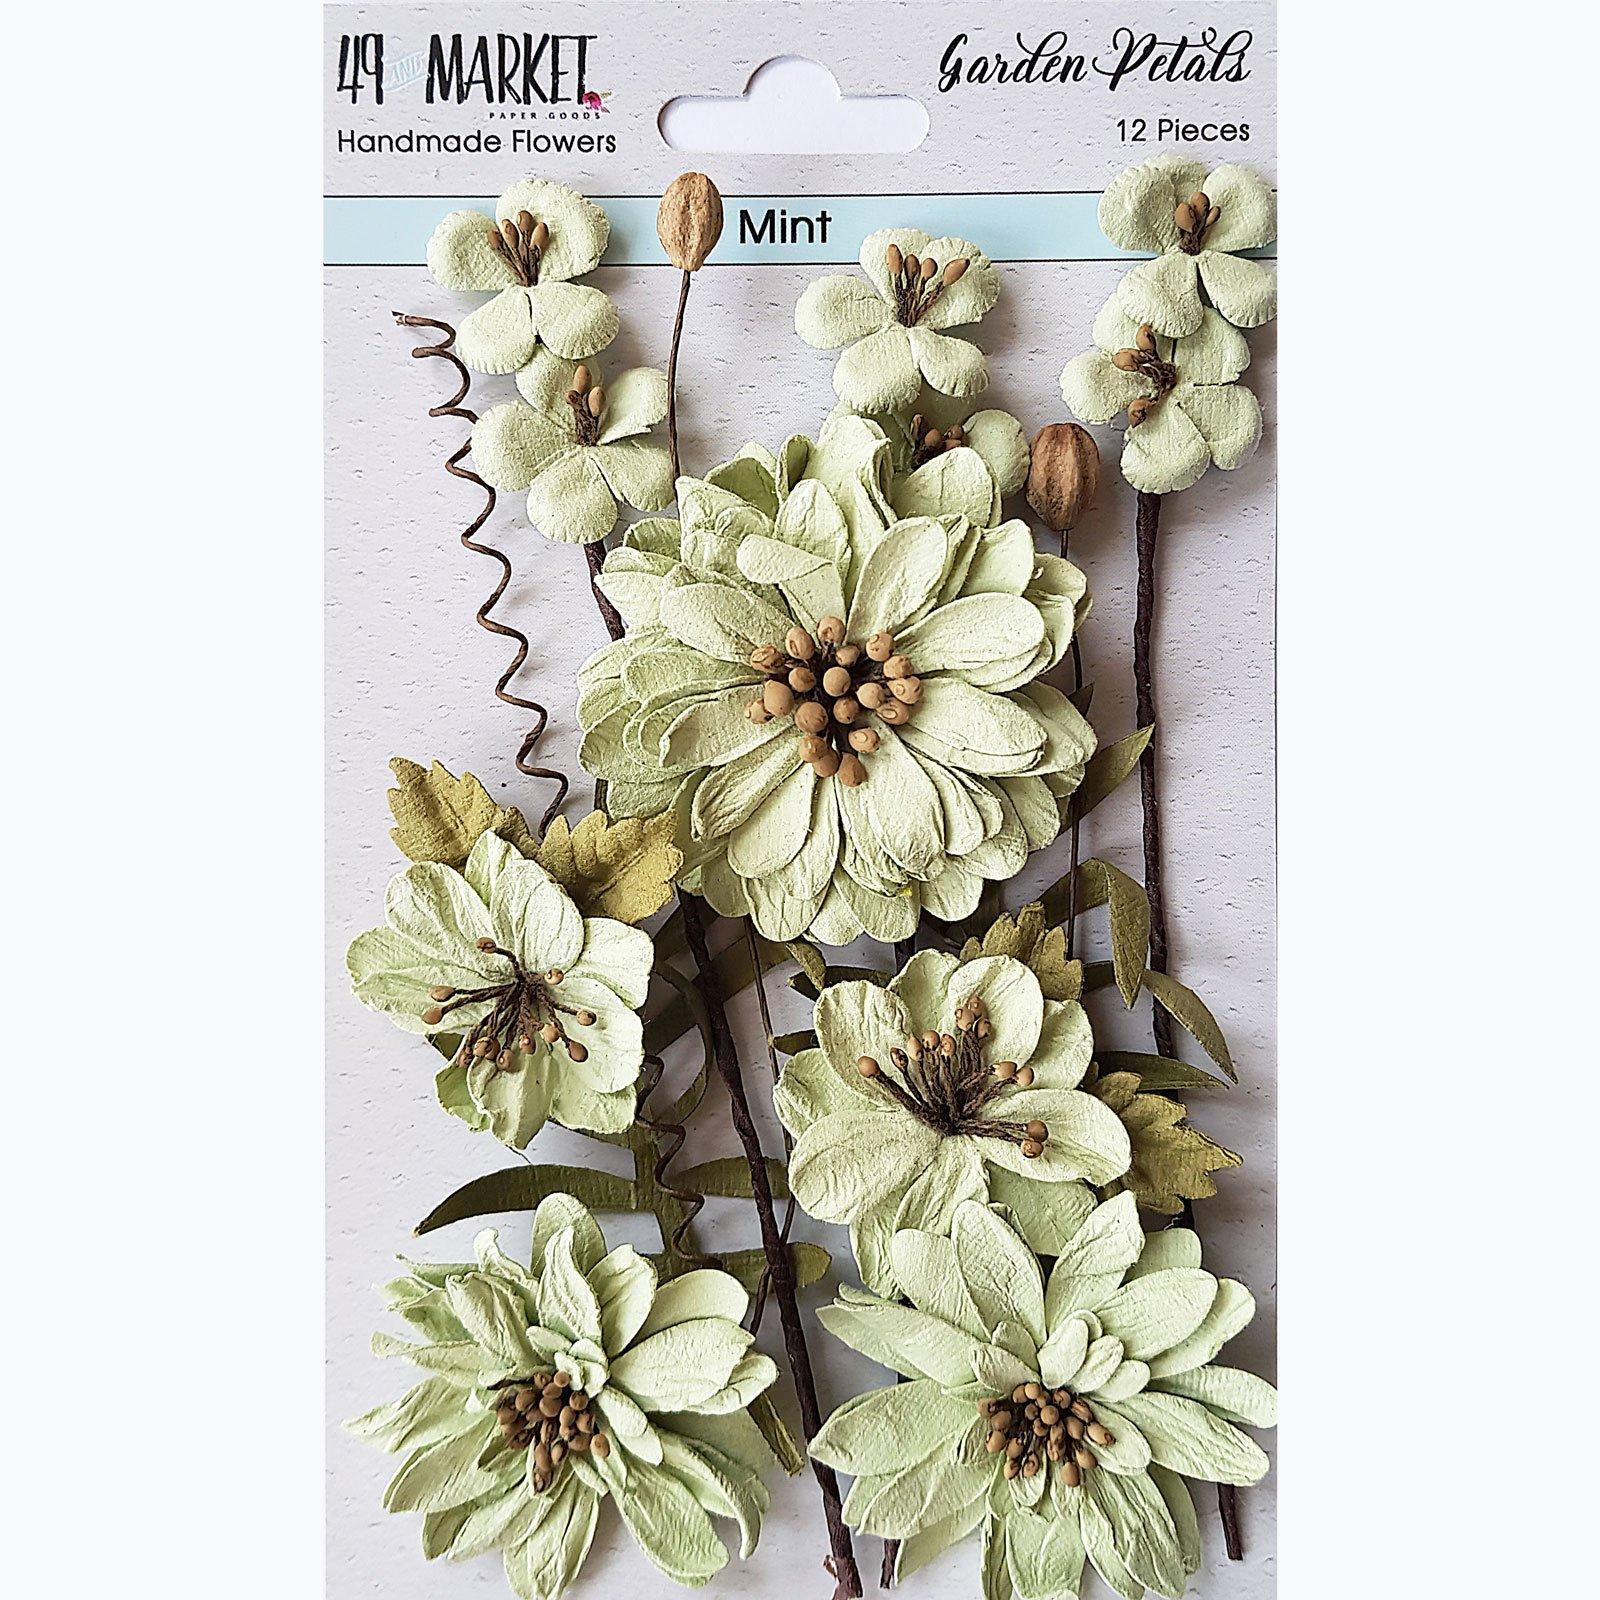 49 & Market - Garden Petals: Mint